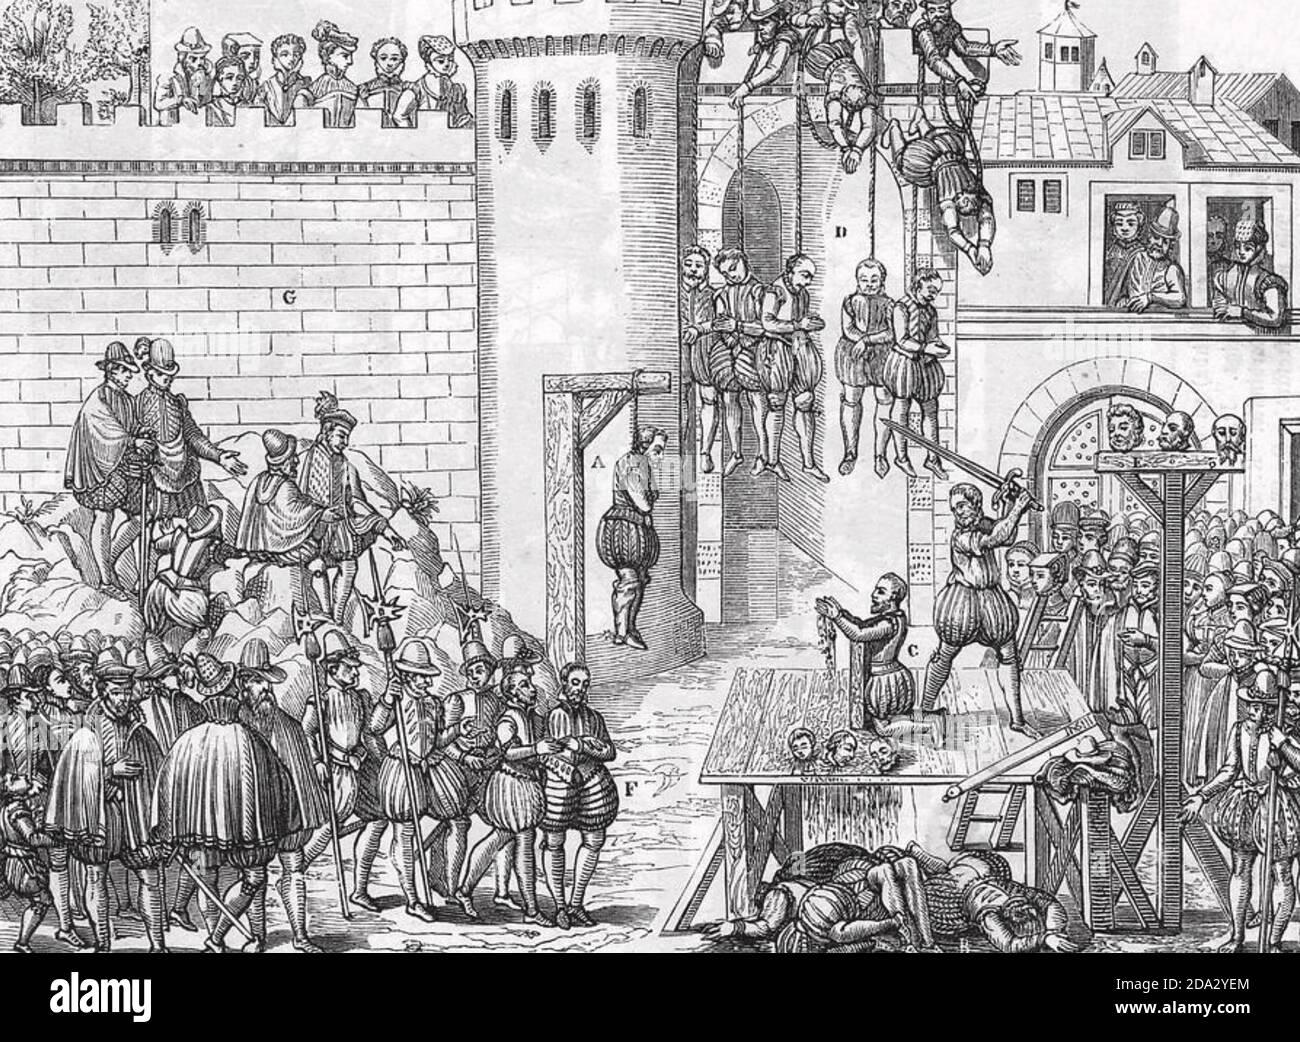 MASSACRE OF THE HUGUENOTS in Paris on St Bartholomew's Day 24 August 1572 Stock Photo